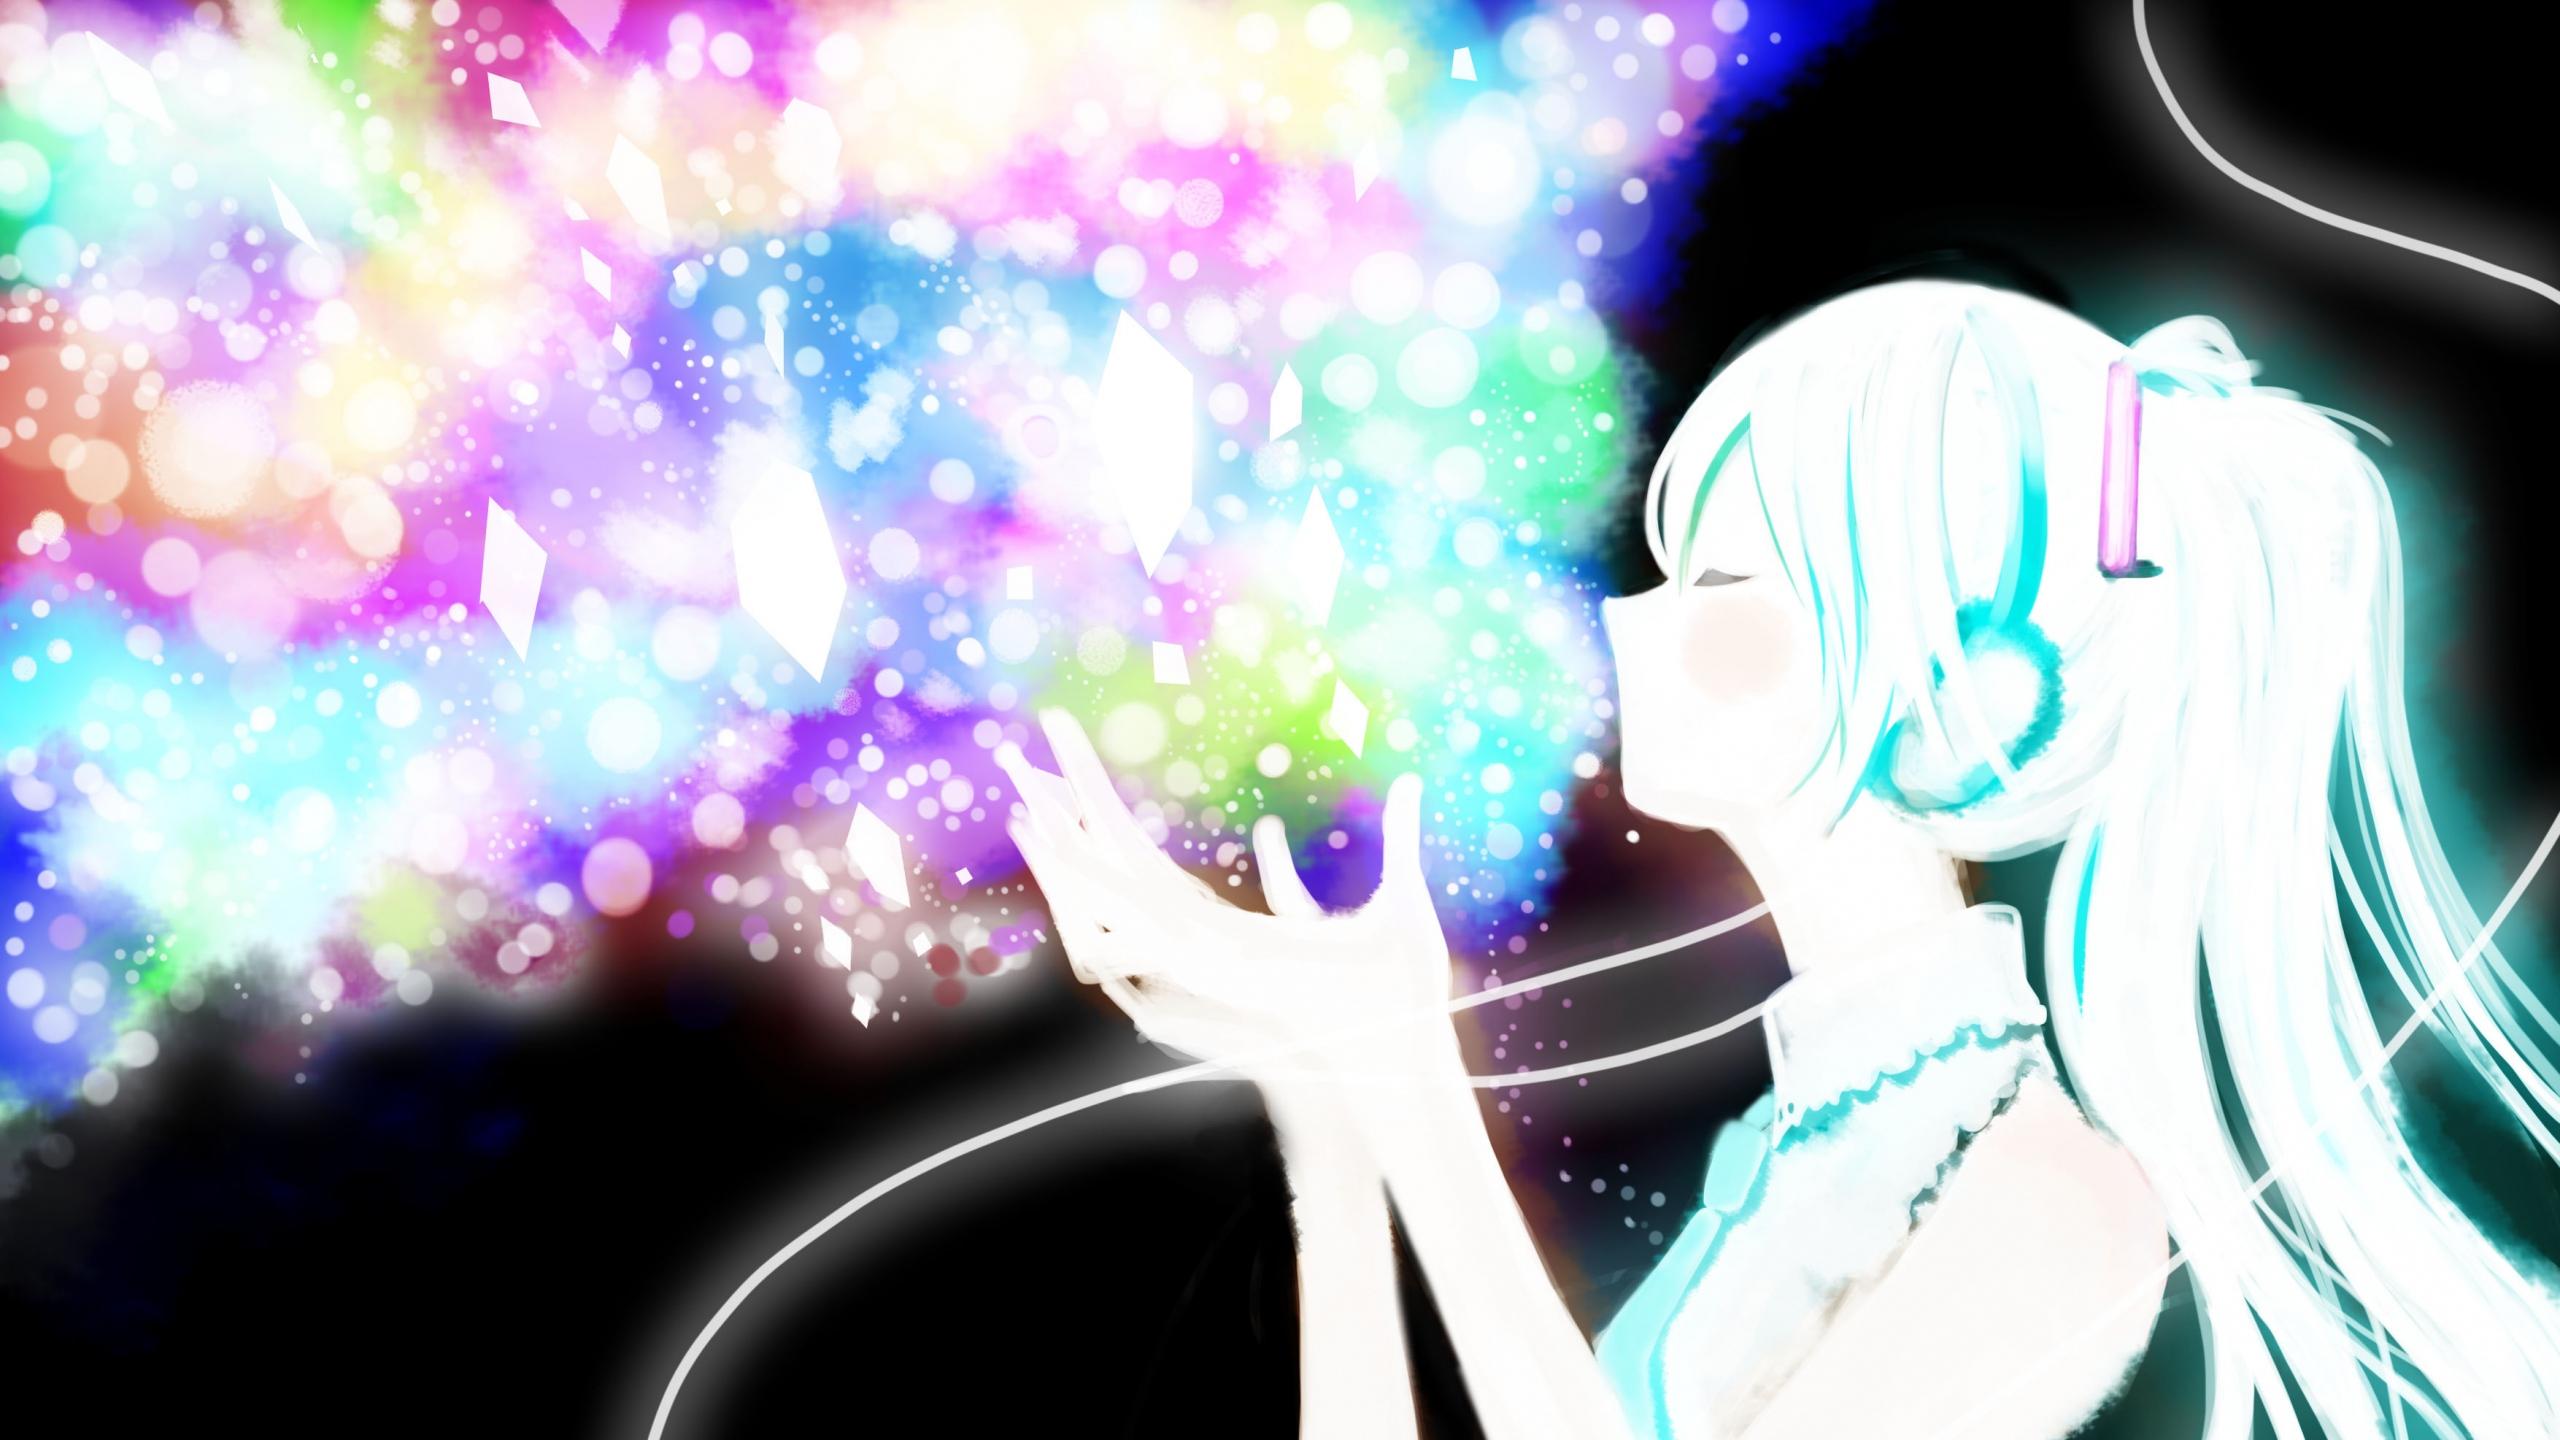 miku Vocaloid Anime Girl Glitter Wallpaper Background Mac iMac 27 2560x1440